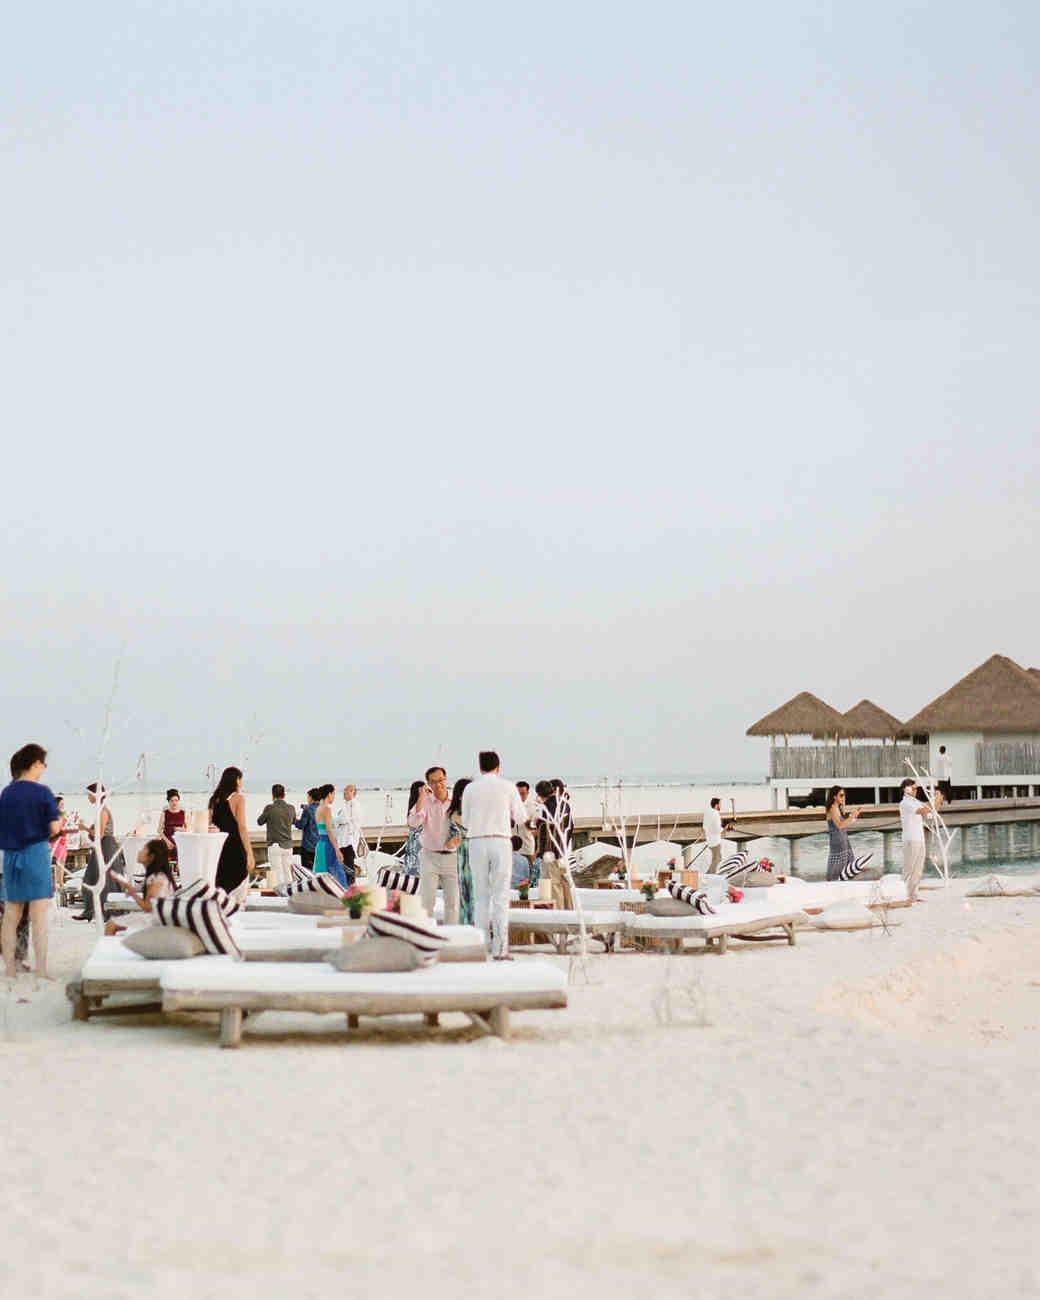 peony-richard-wedding-maldives-reception-guests-0698-s112383.jpg